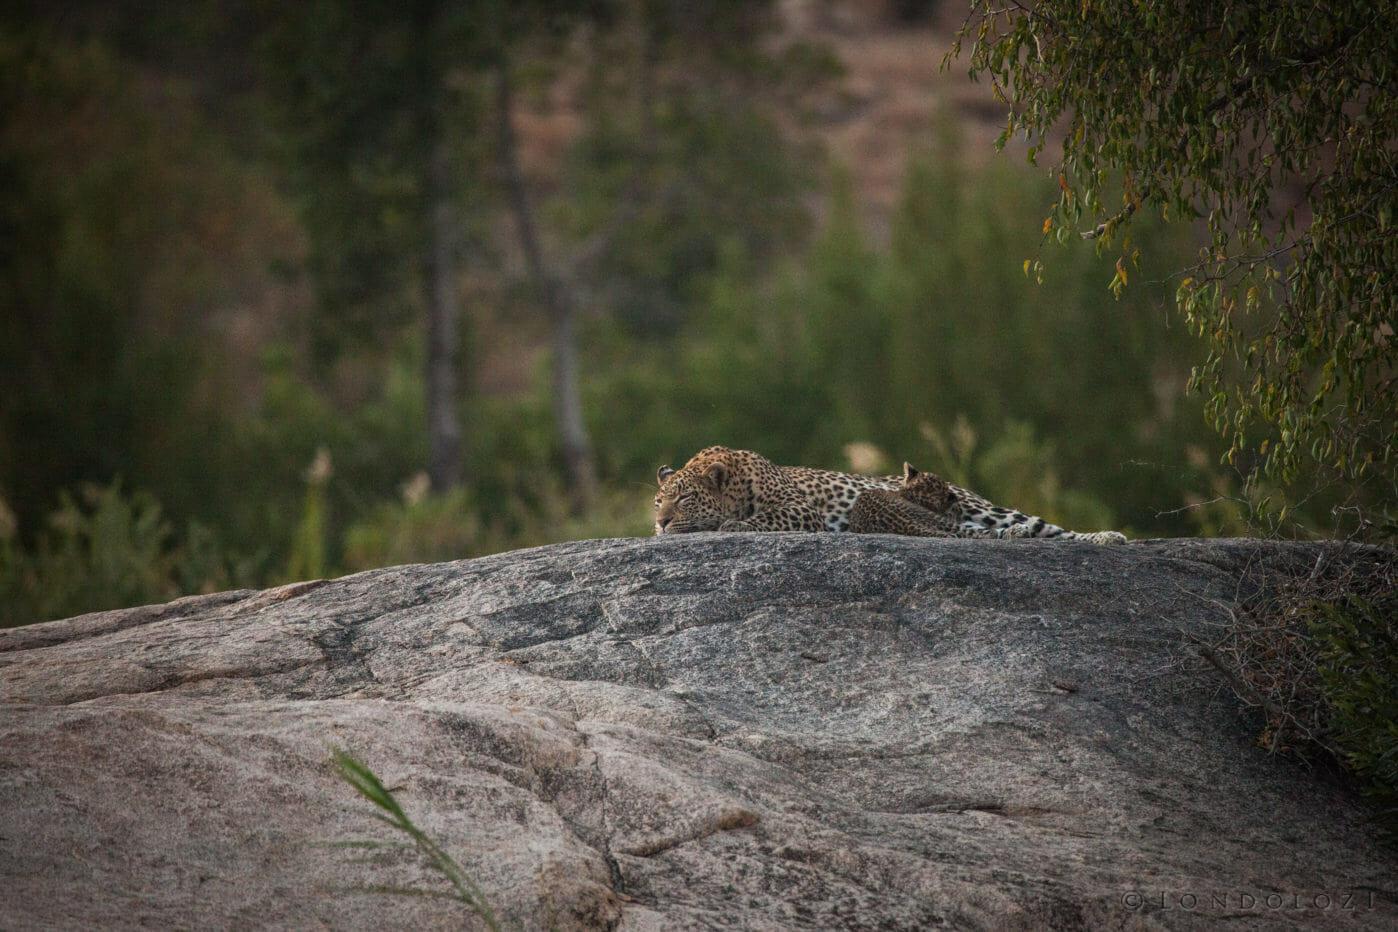 Nkoveni female leopard, cub, nursing, suckling, plaque rock, Sand River